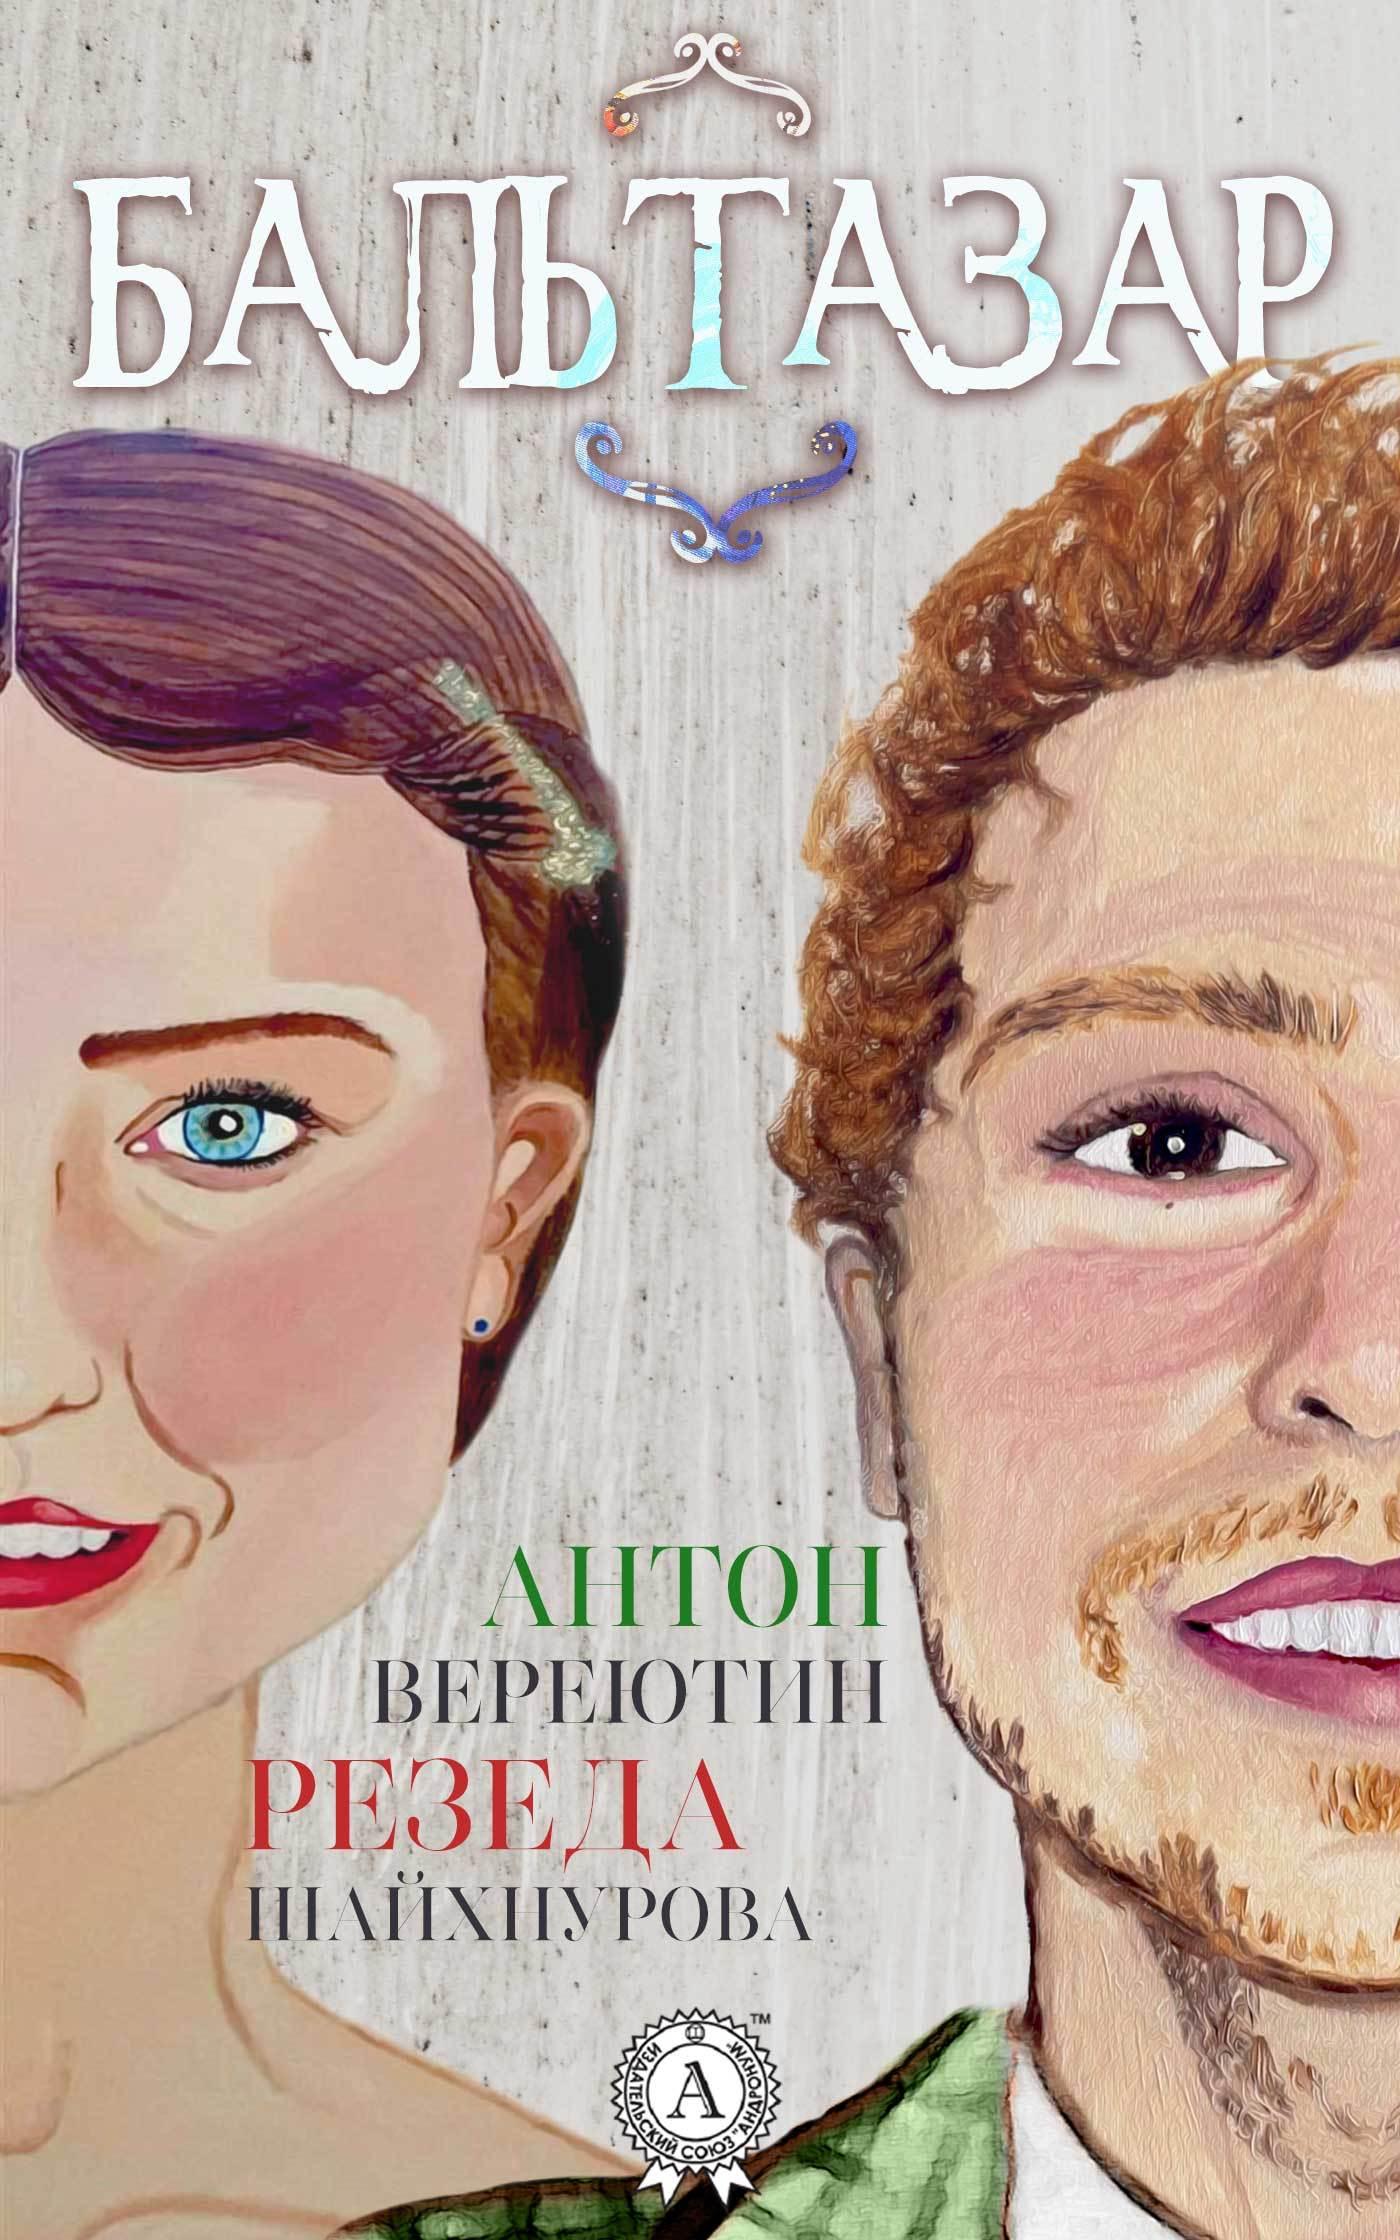 Резеда Шайхнурова, Антон Вереютин - Бальтазар